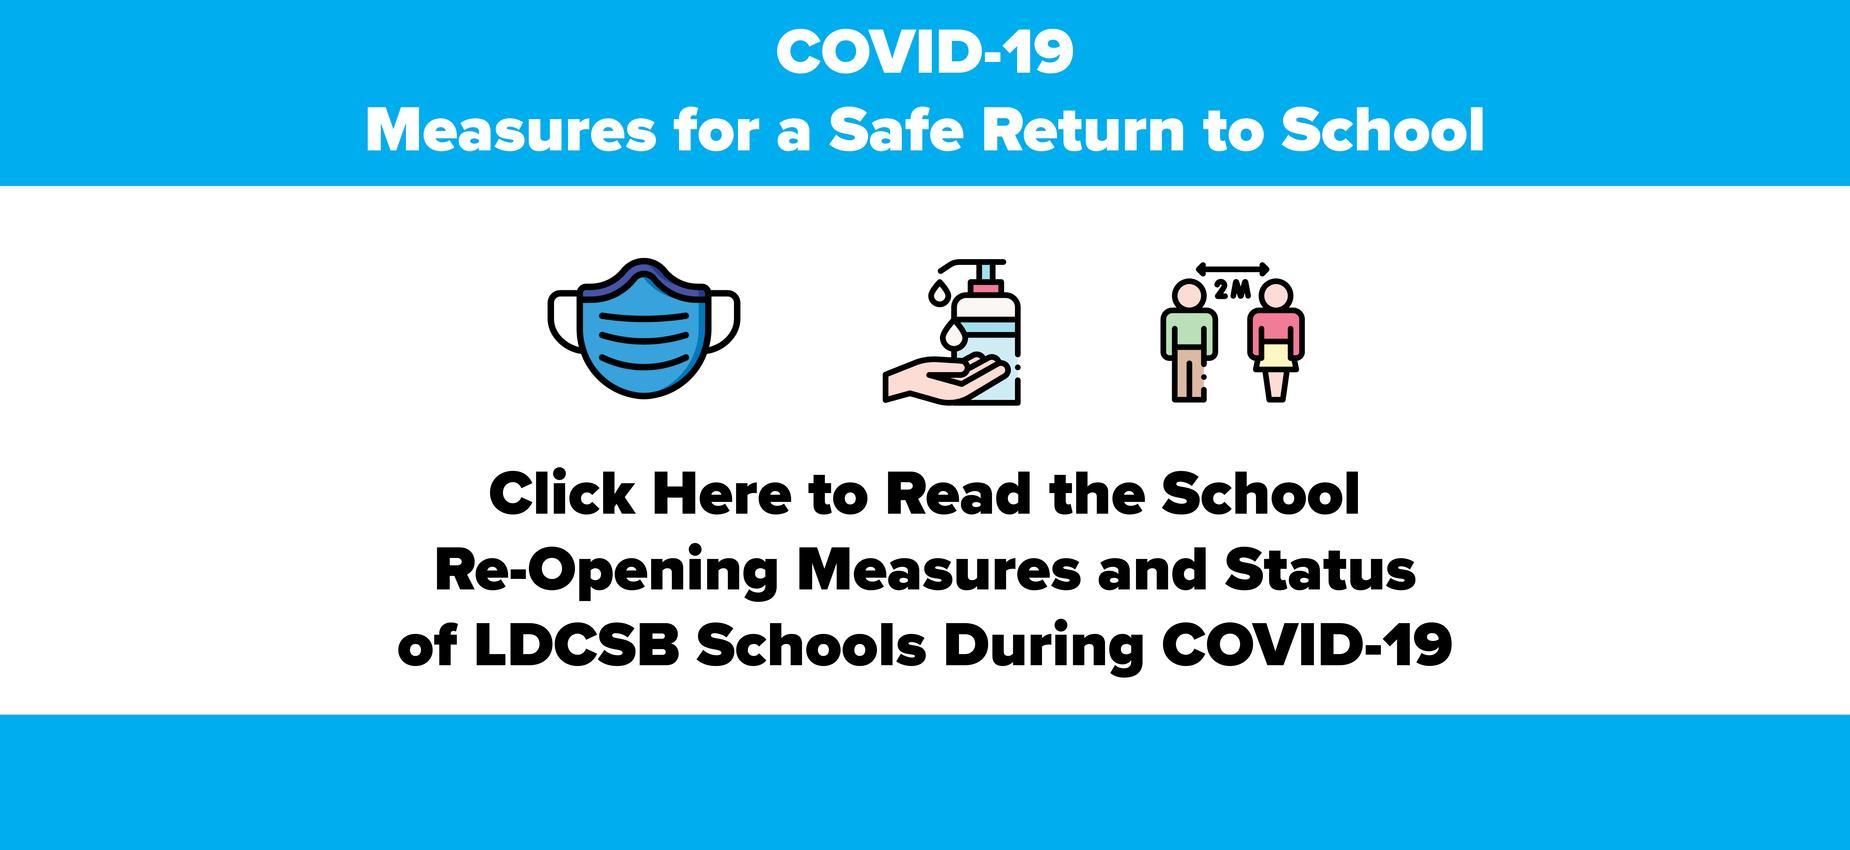 Status of LDCSB Schools During COVID-19